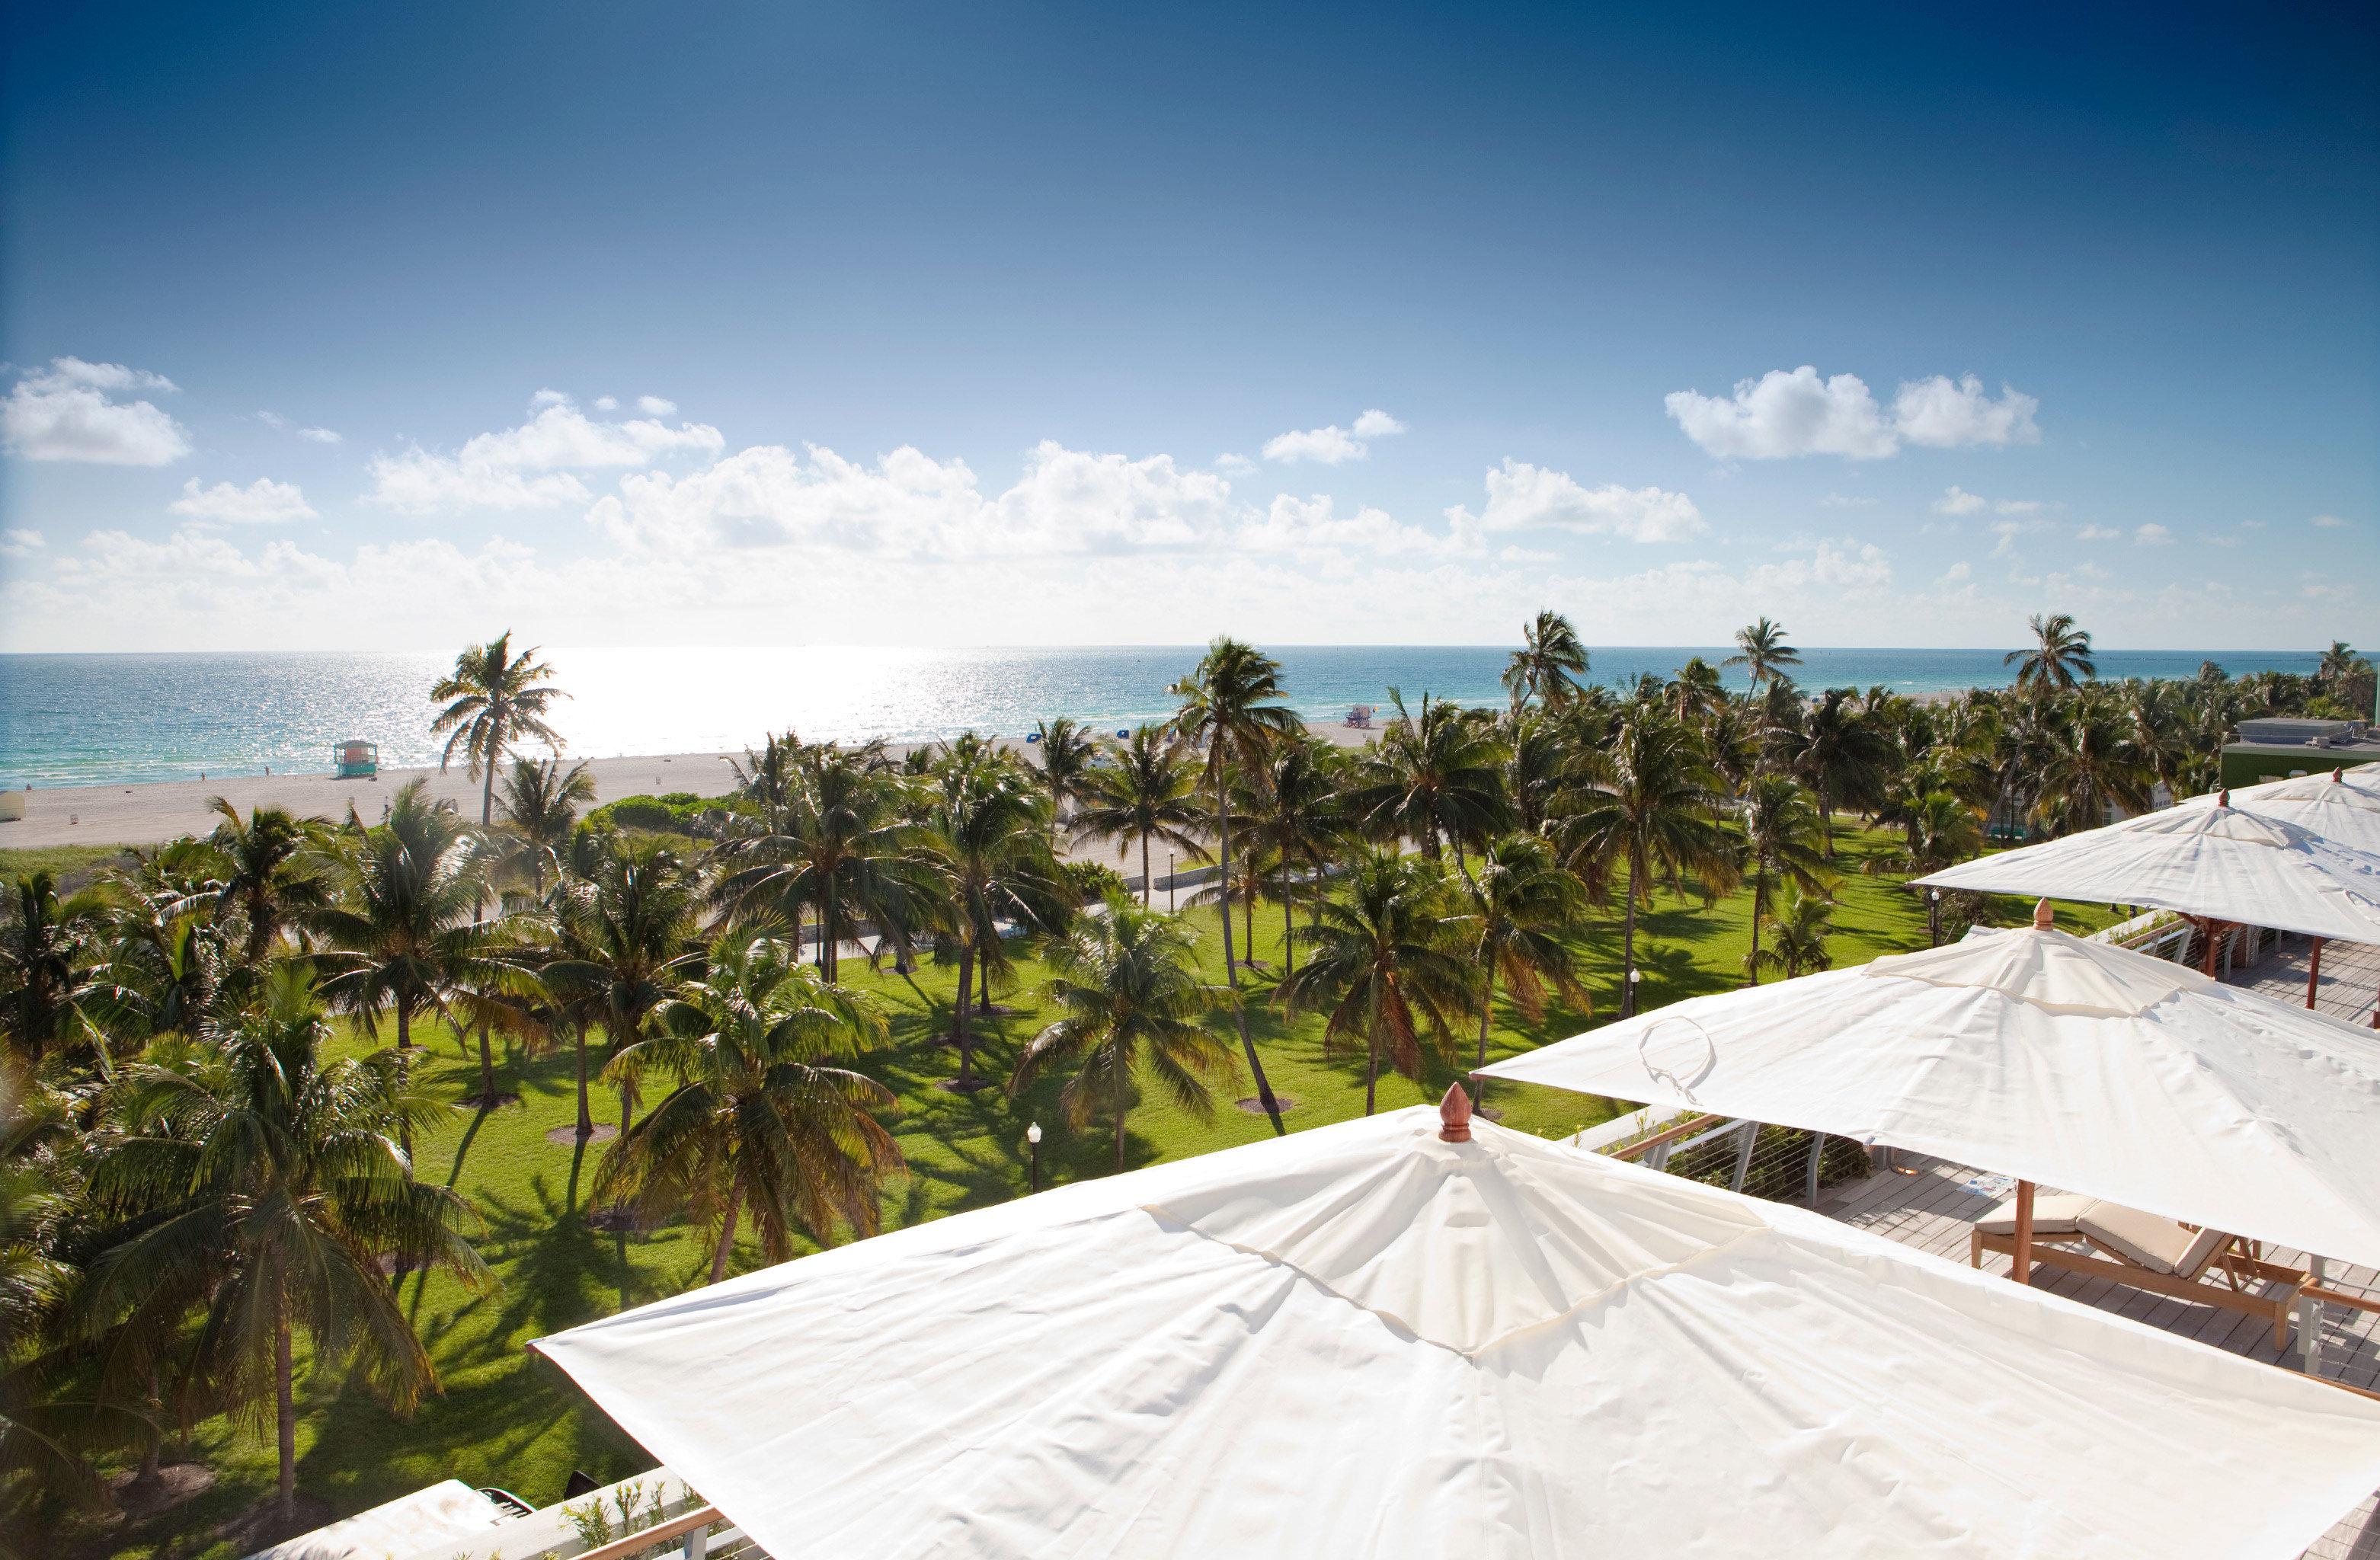 Beach Beachfront Ocean Resort Scenic views sky Sea atmosphere of earth caribbean Coast